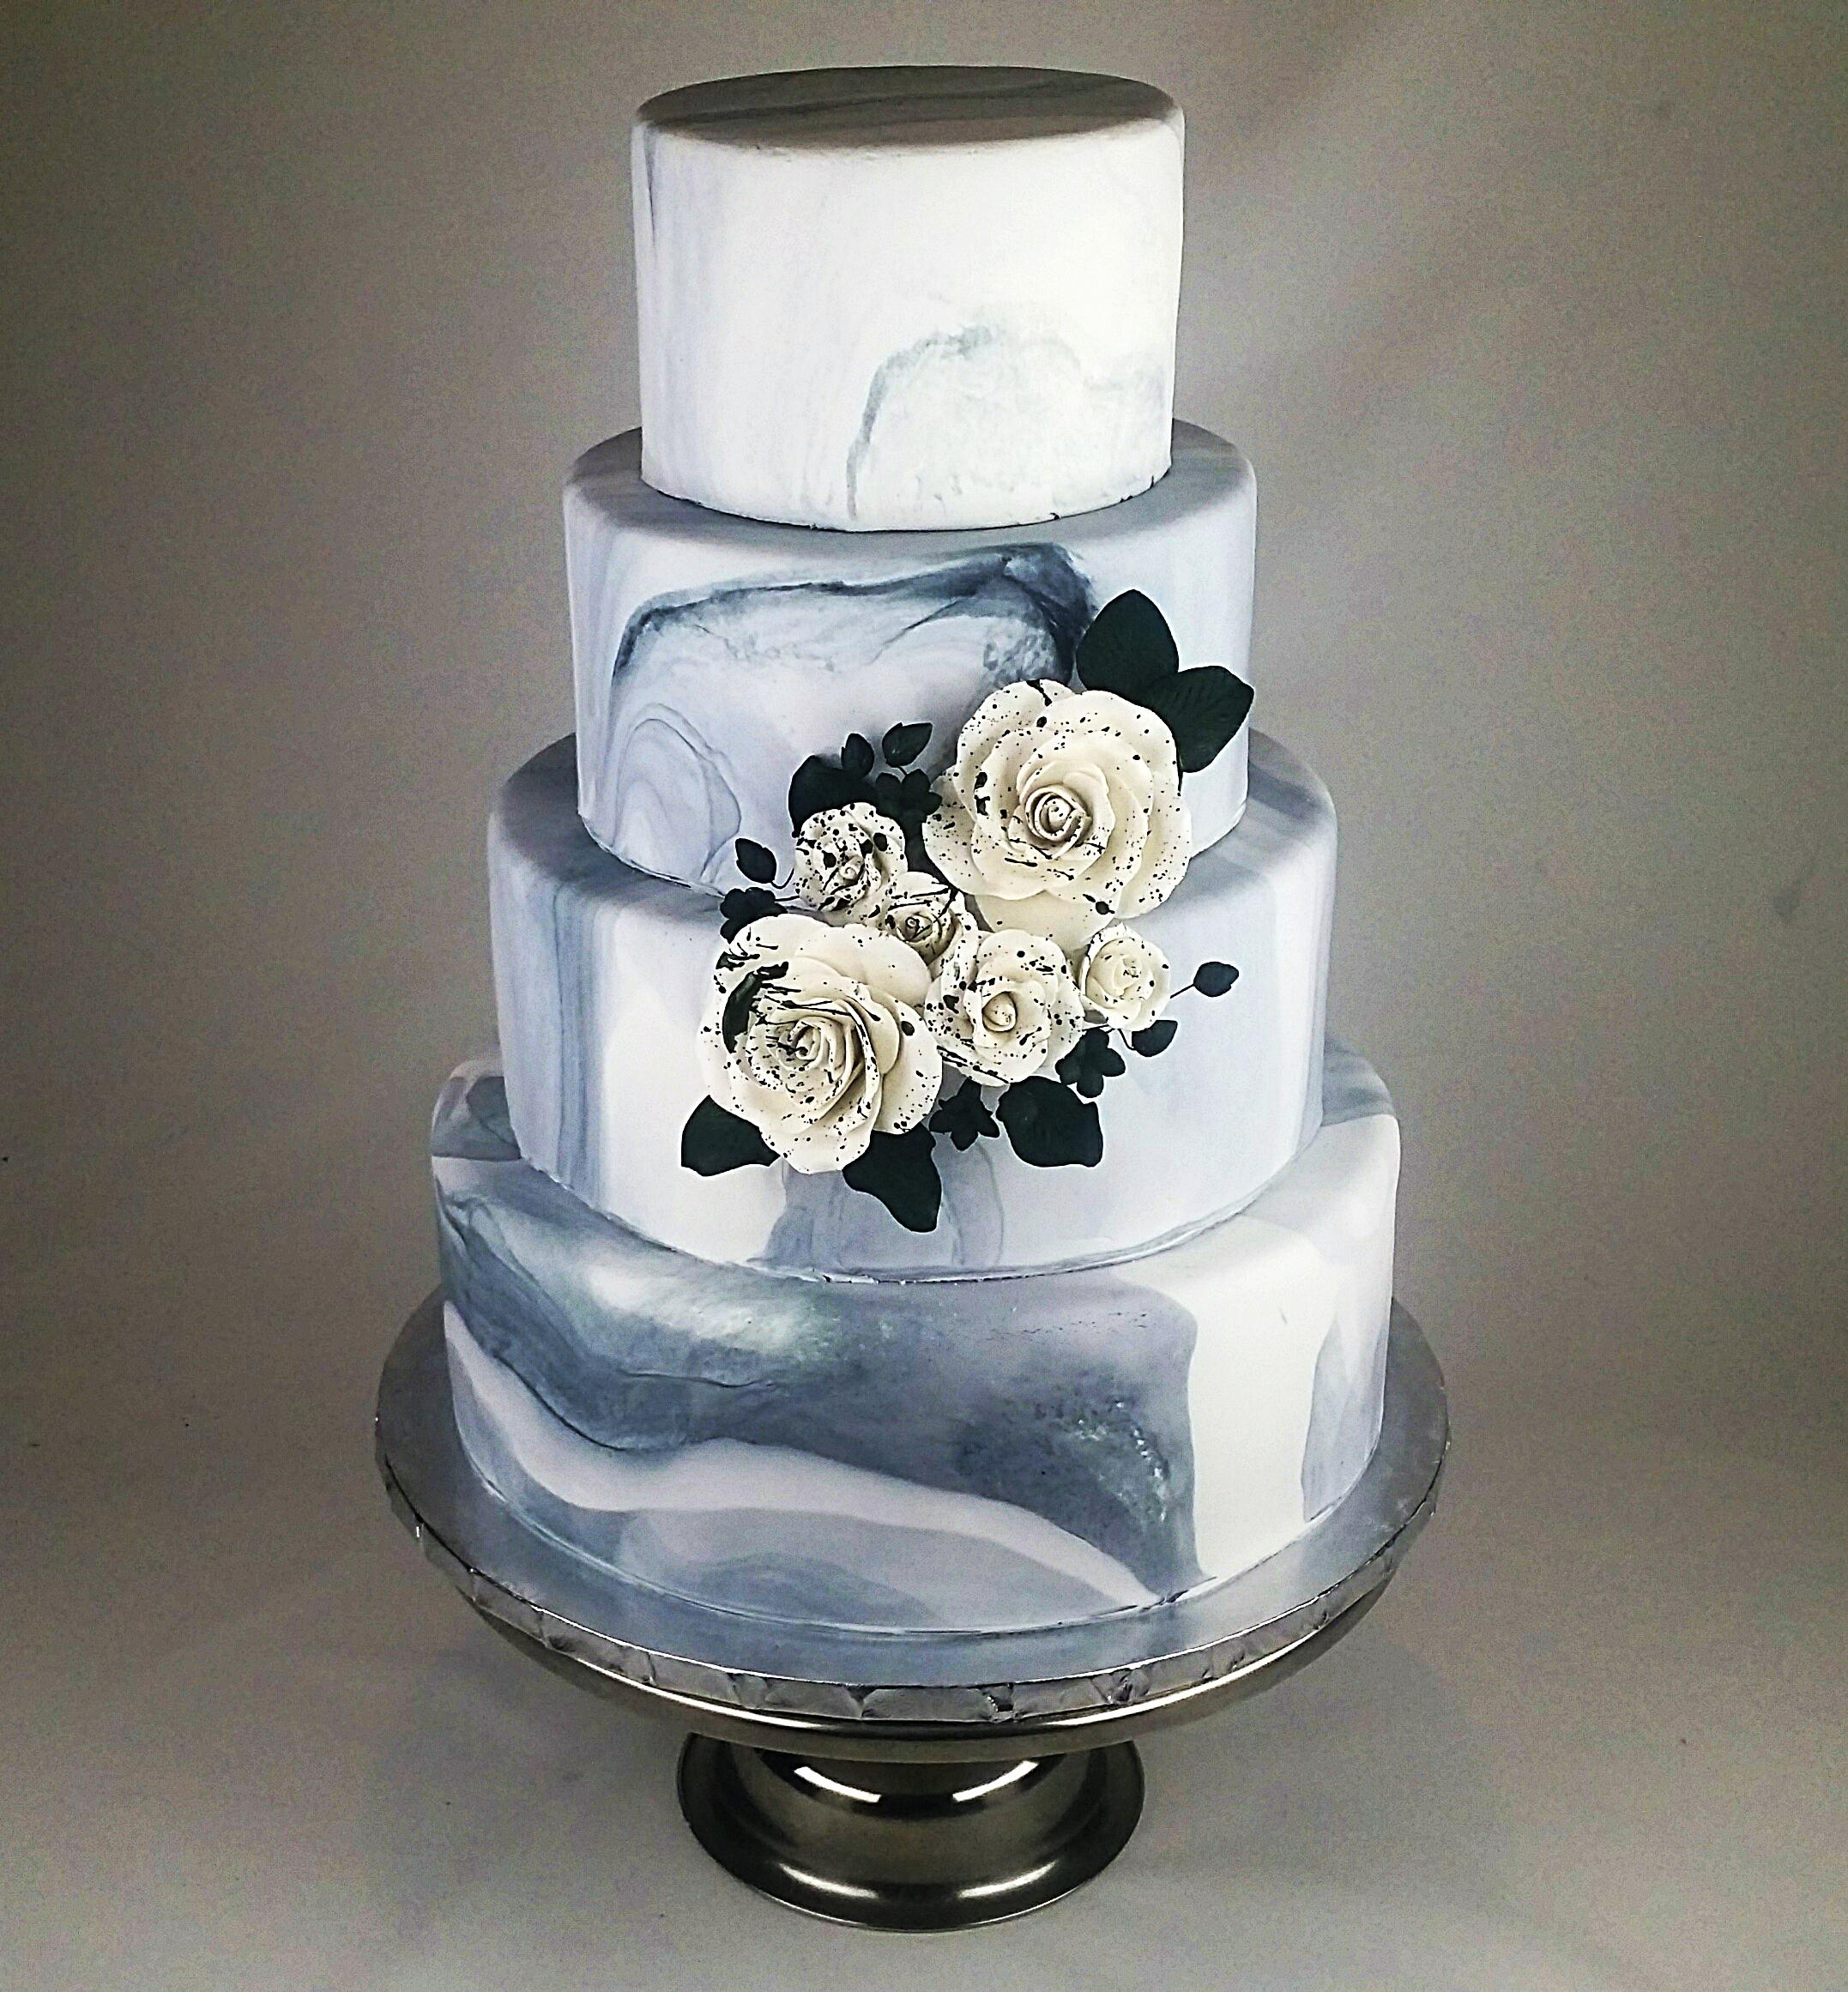 Marbled Fondant Wedding Cake by   Celebrity Cafe & Bakery